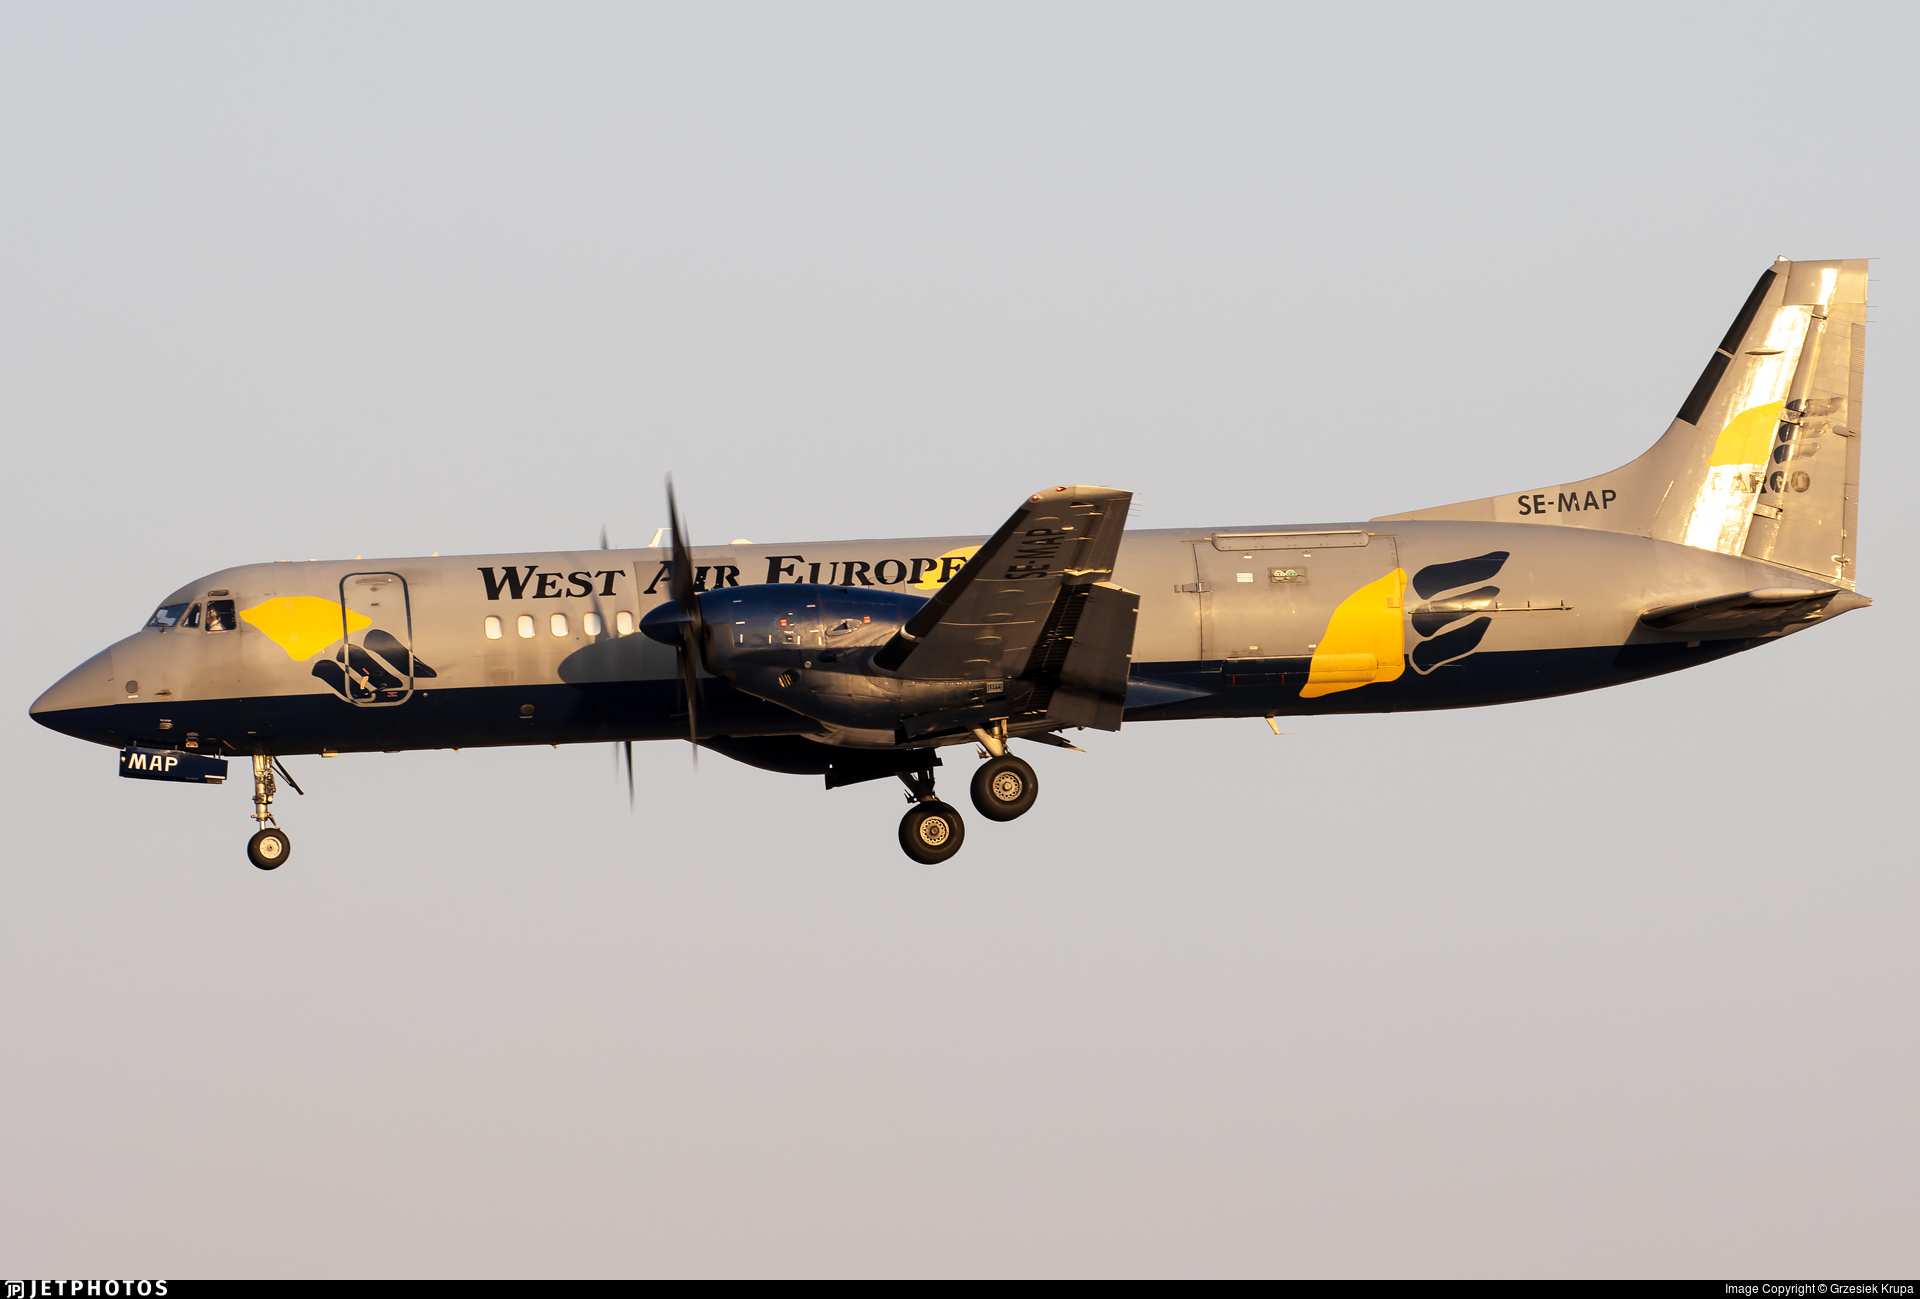 SE-MAP - British Aerospace ATP-F(LFD) - West Air Europe